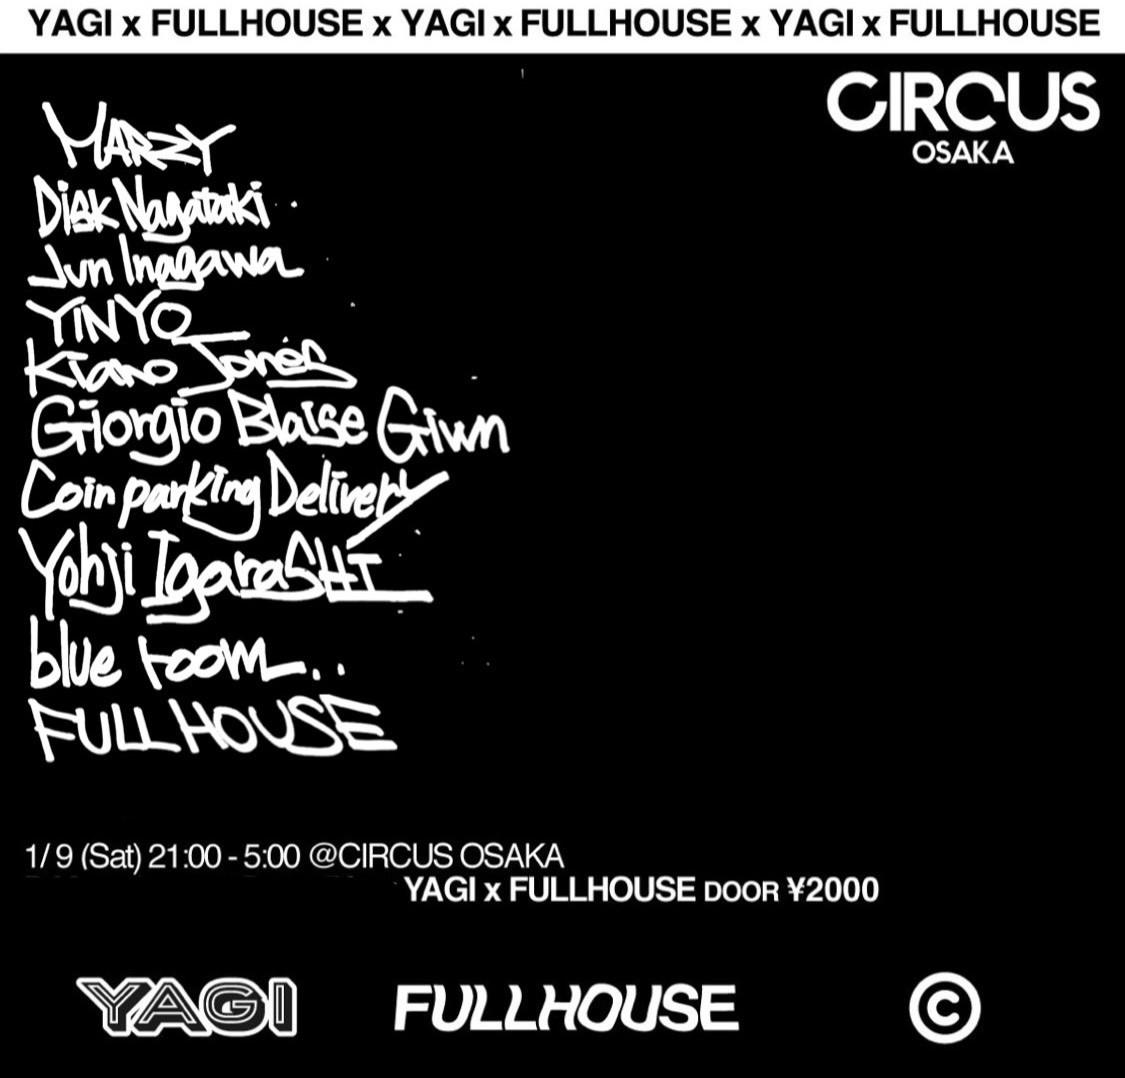 YAGI x FULLHOUSE @ CIRCUS